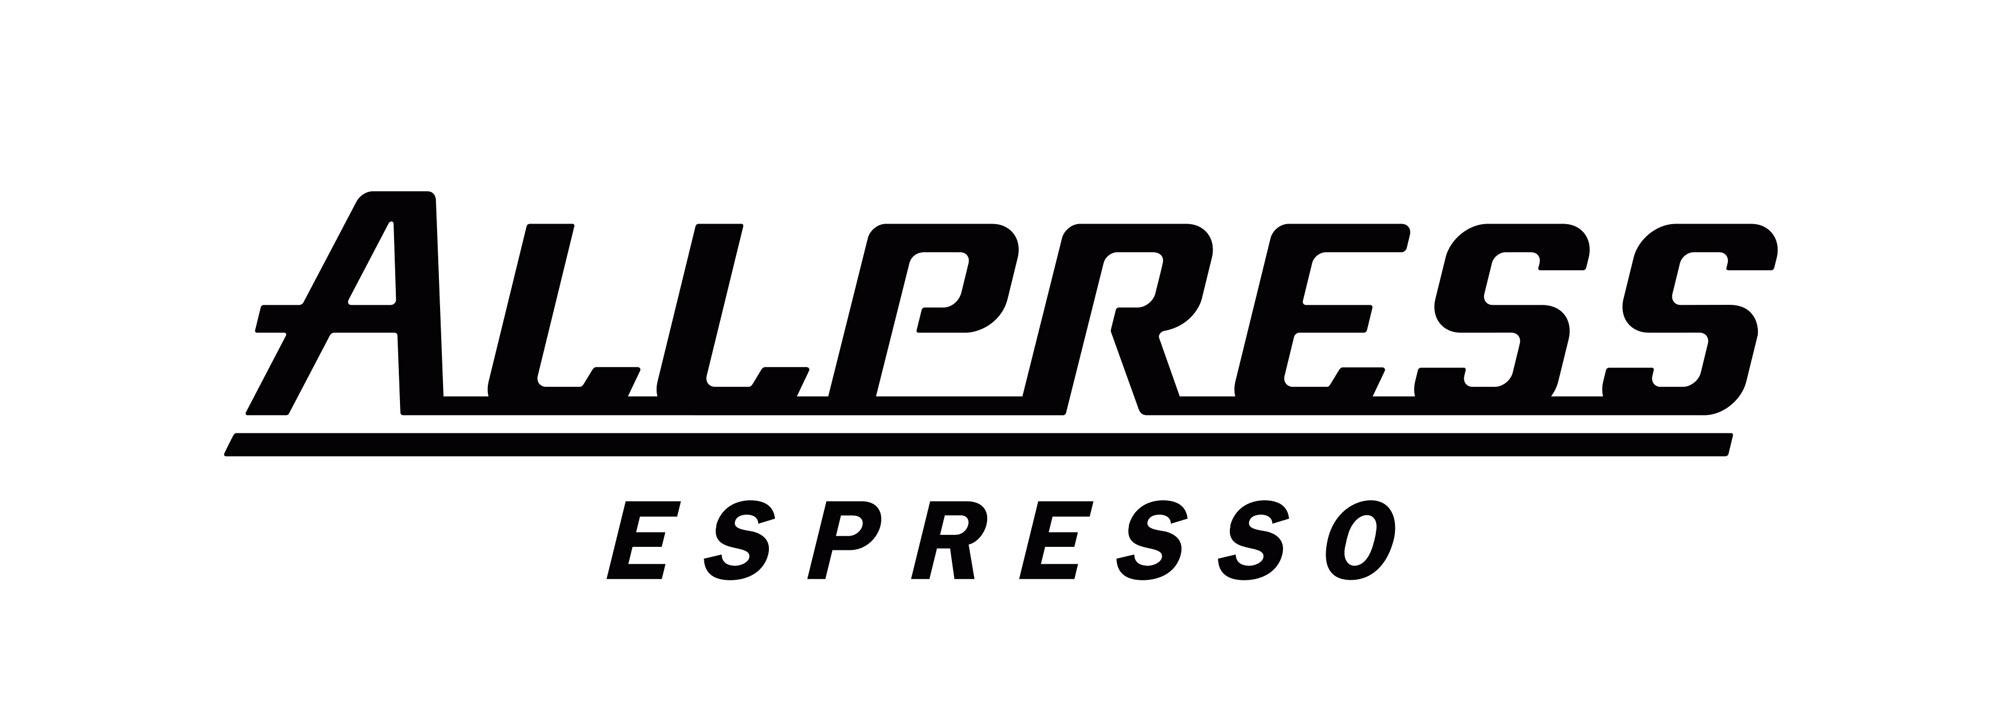 Allpress Espresso Logo 2016.jpg